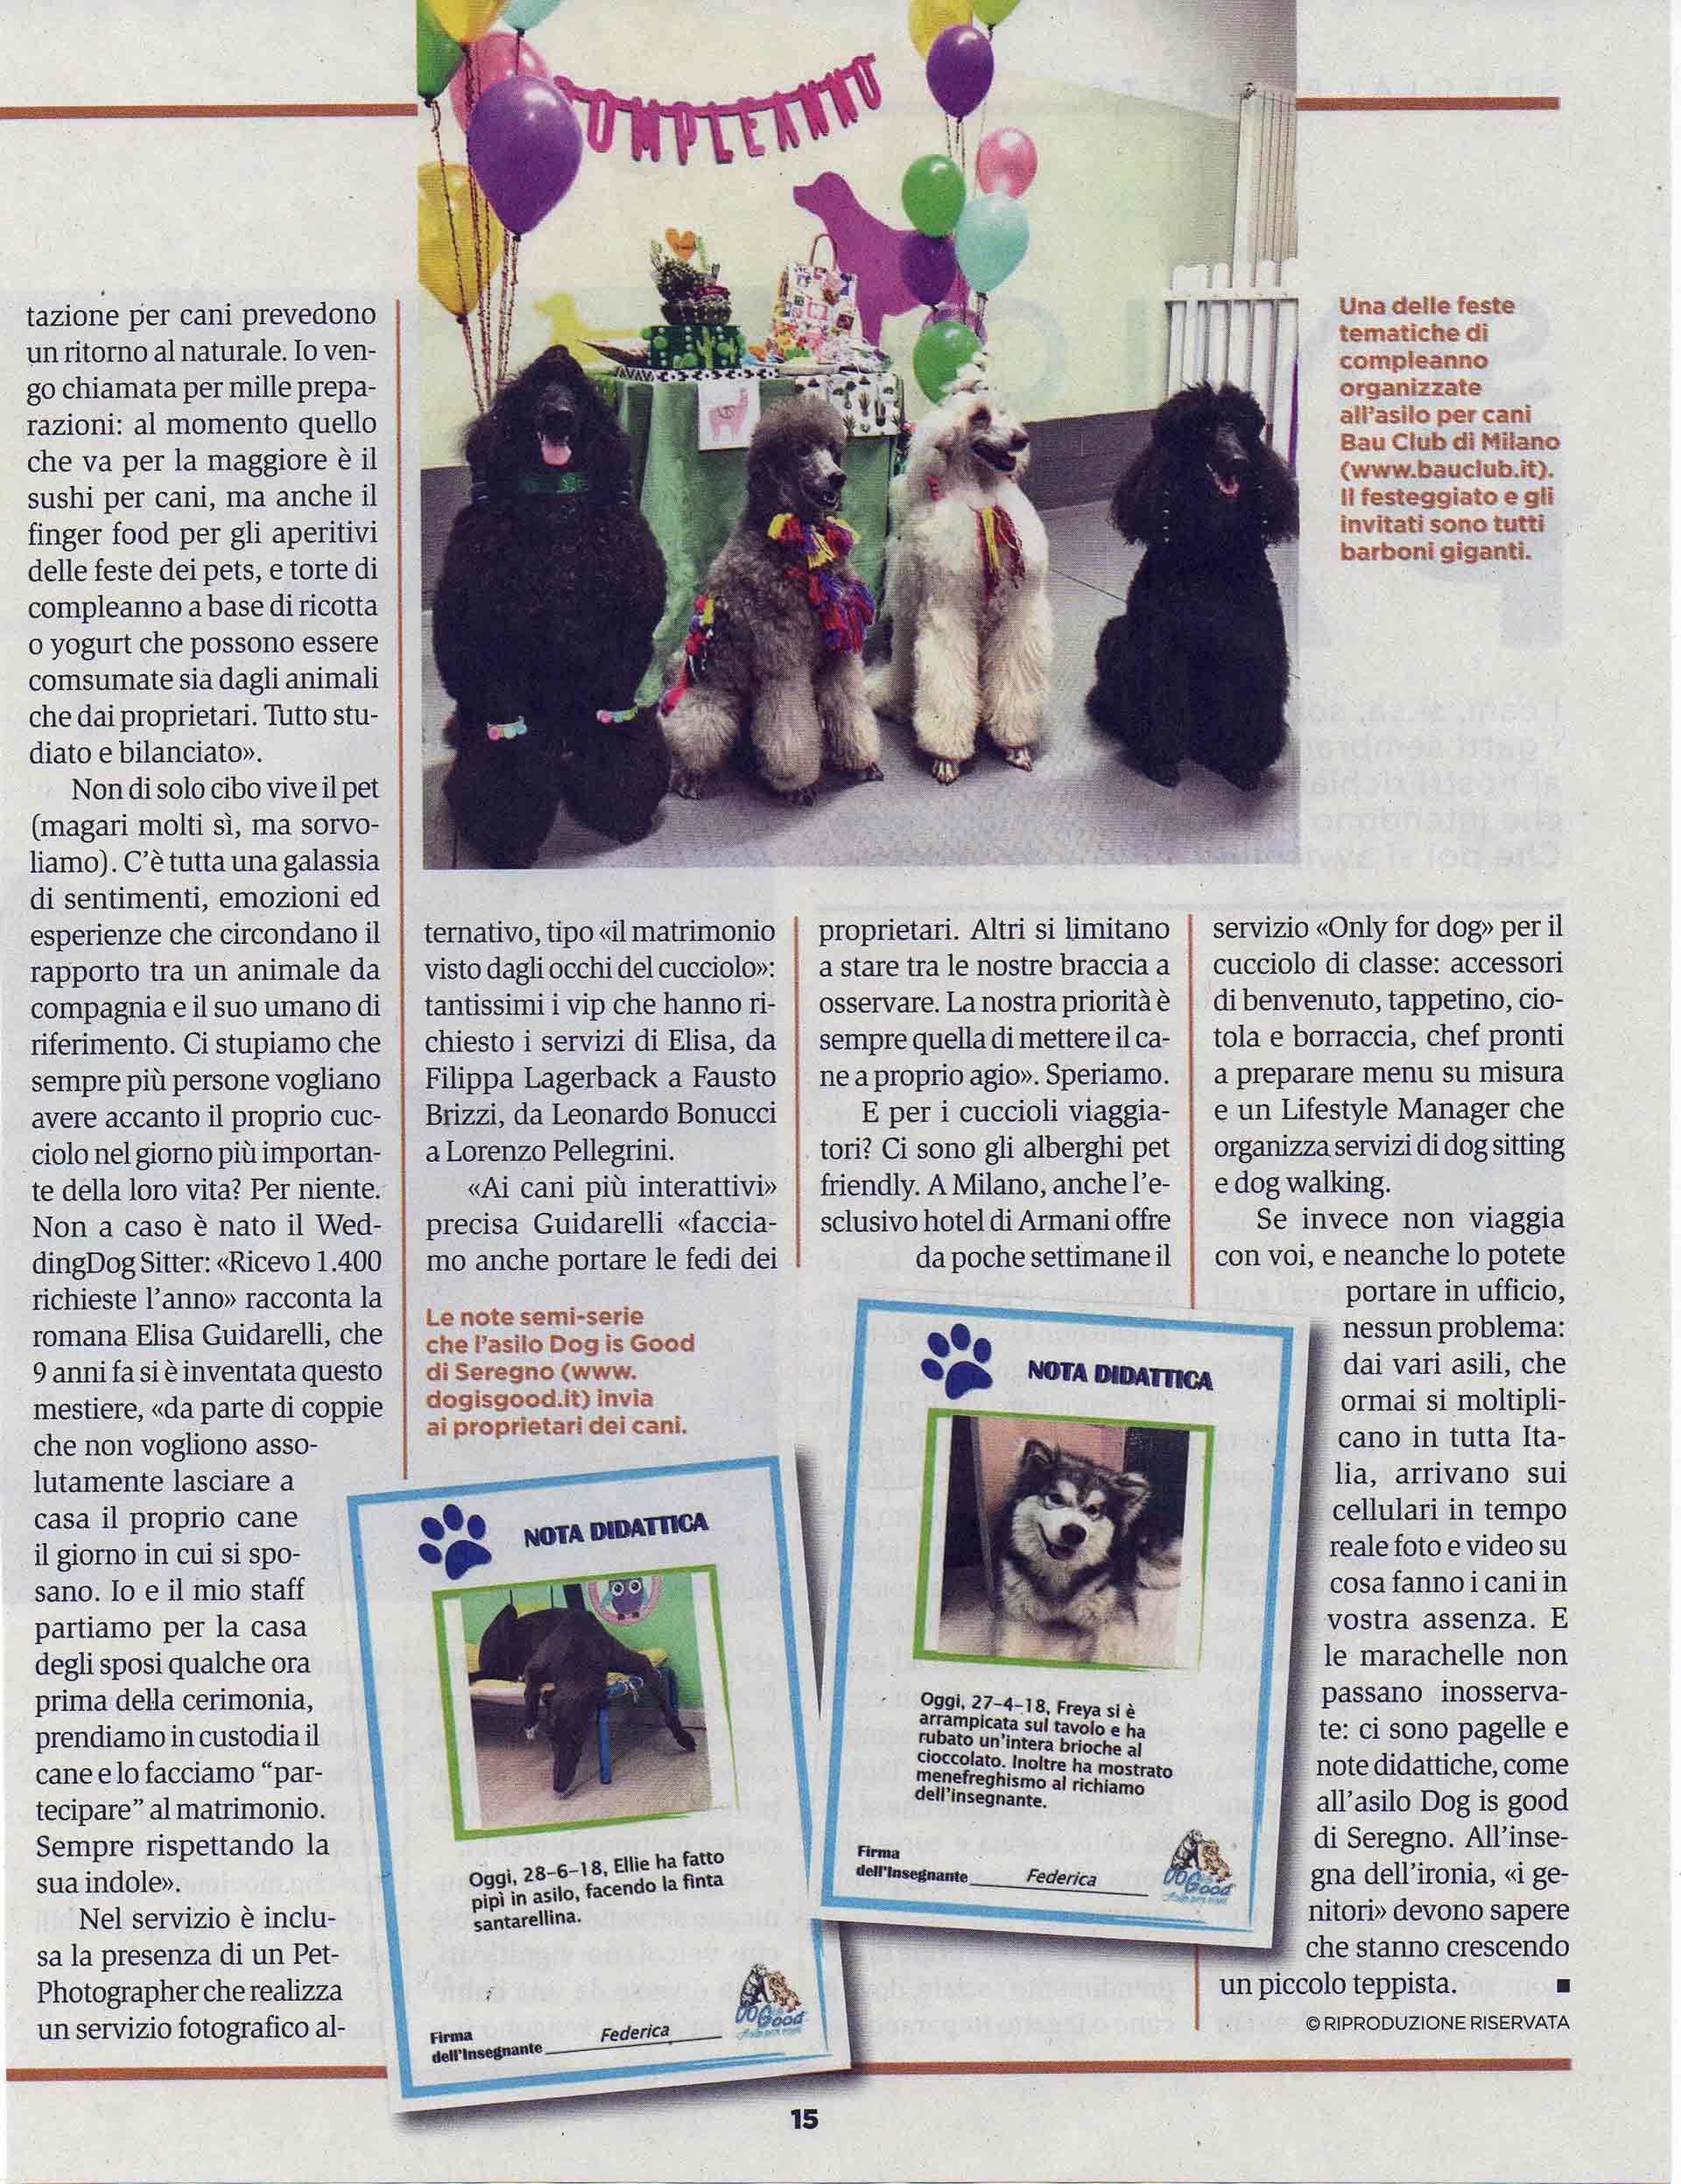 panorama-rivista-bauclub-asilo-educazione-cani-milano-04